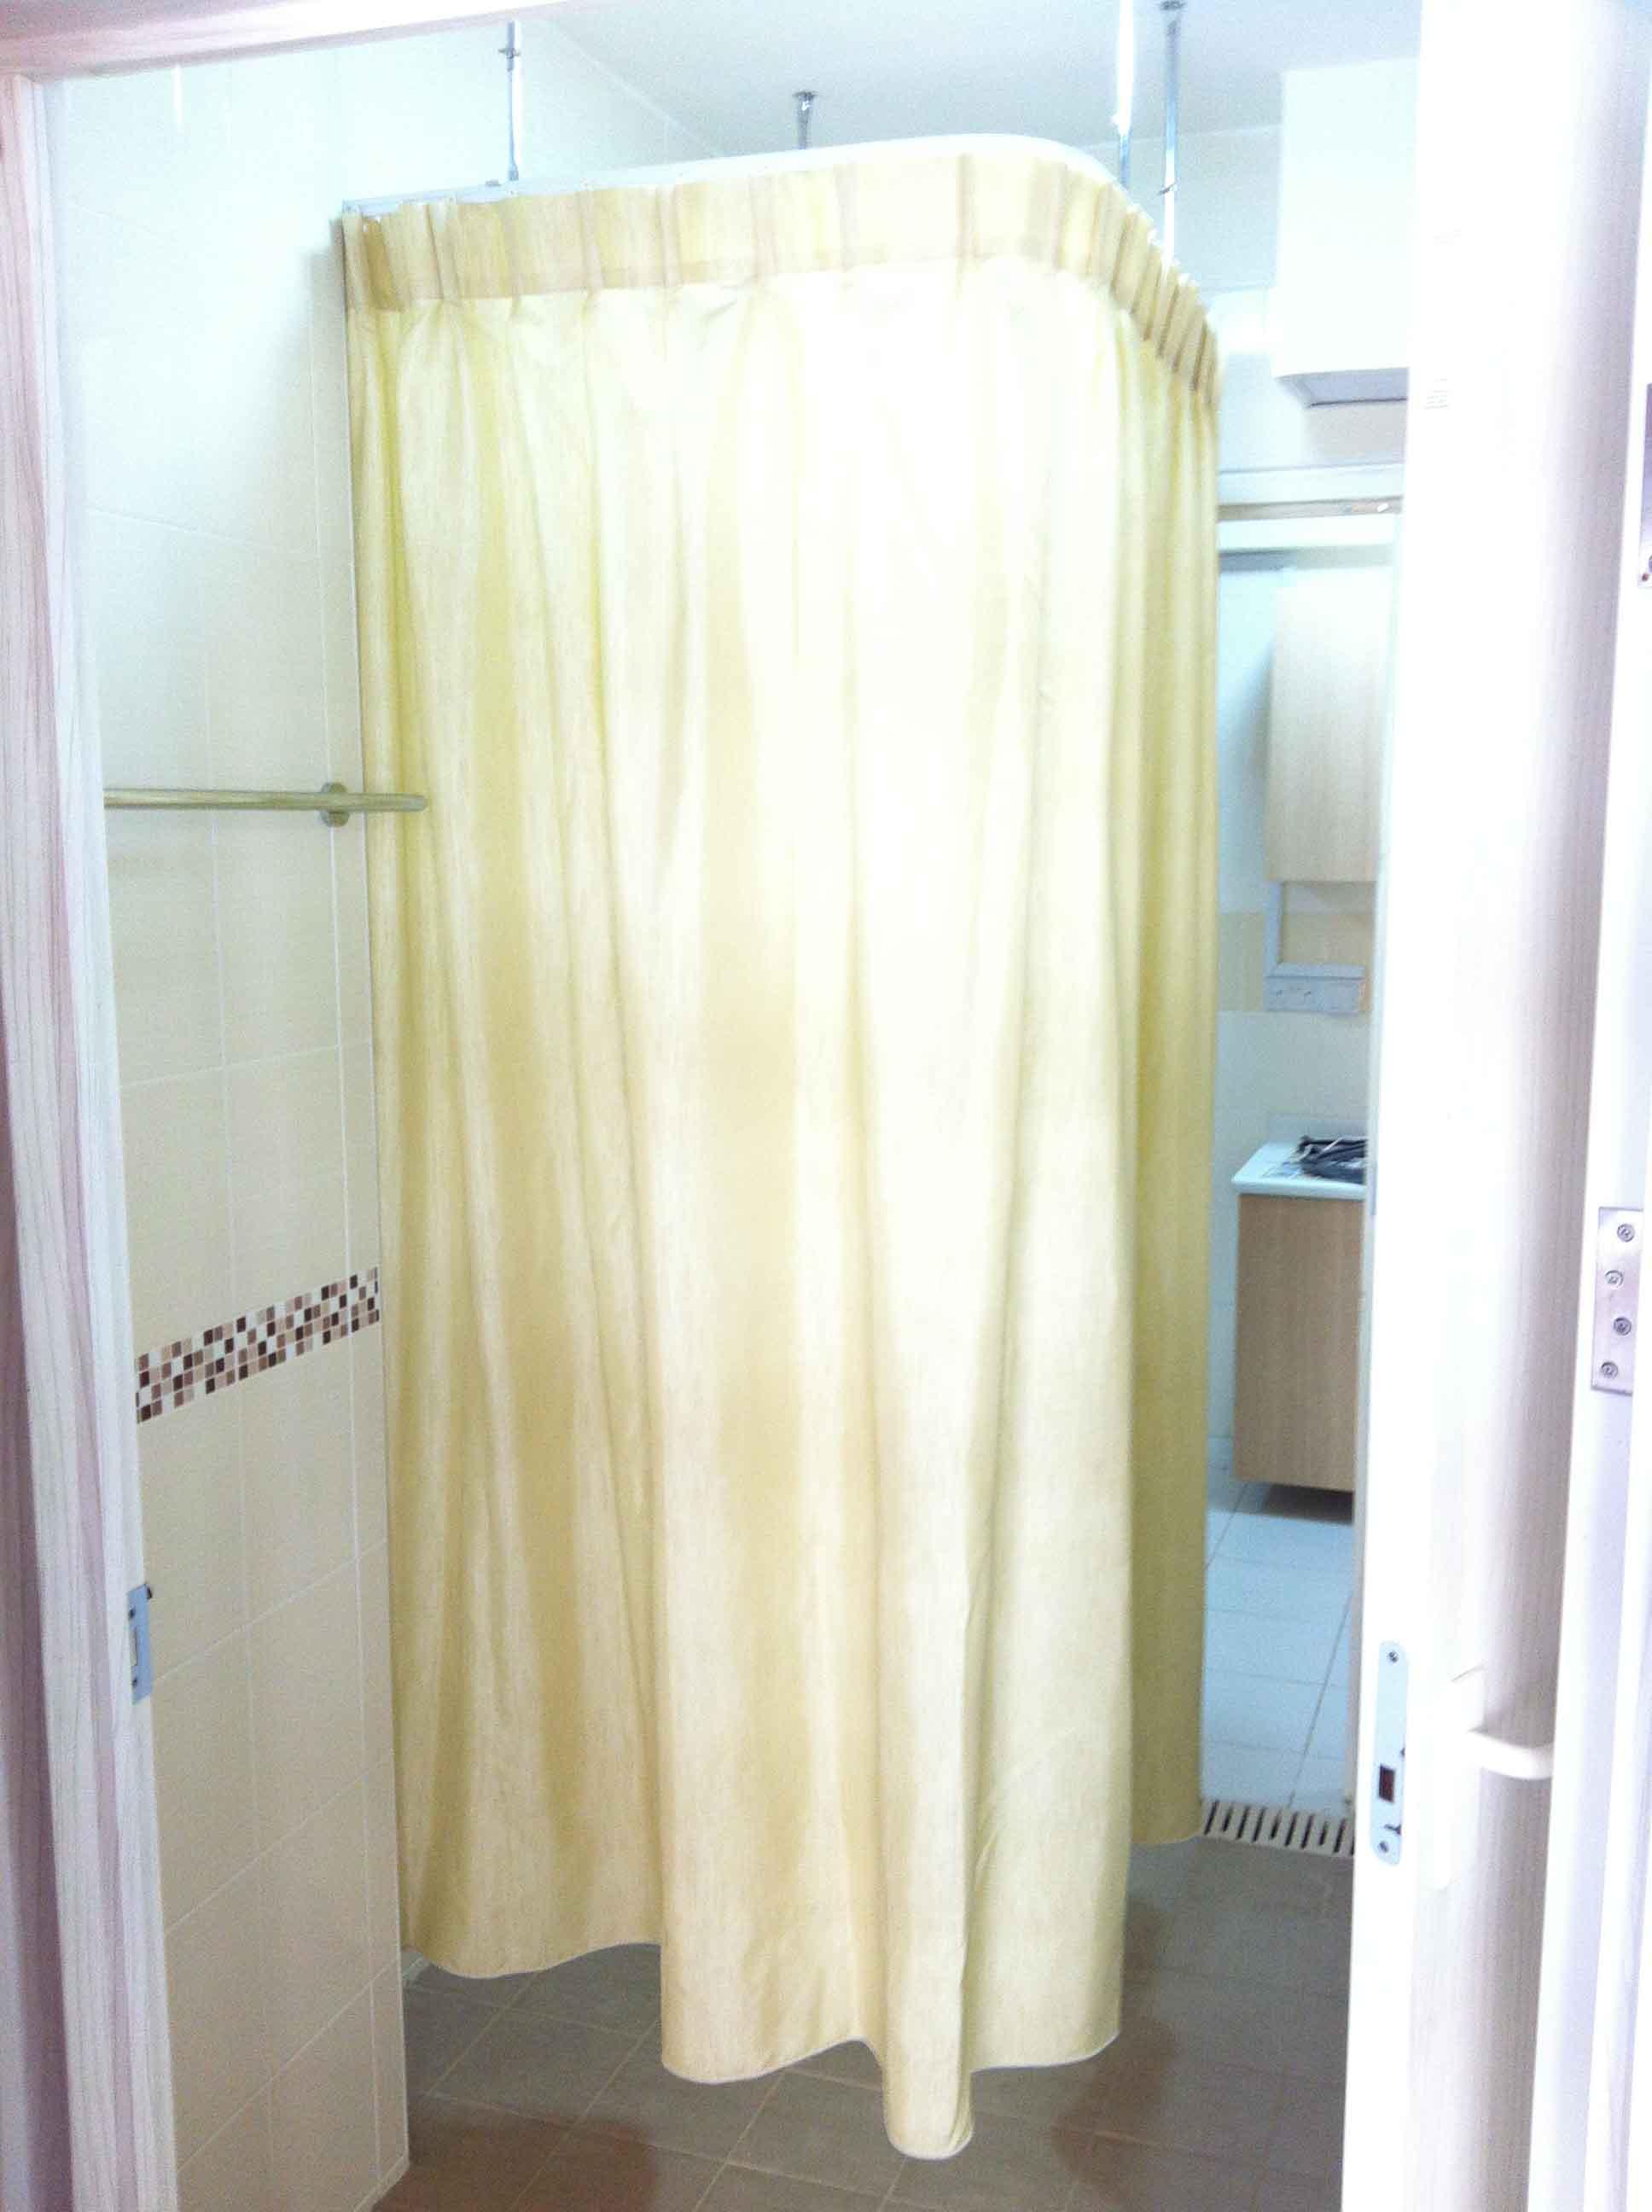 night curtains 3